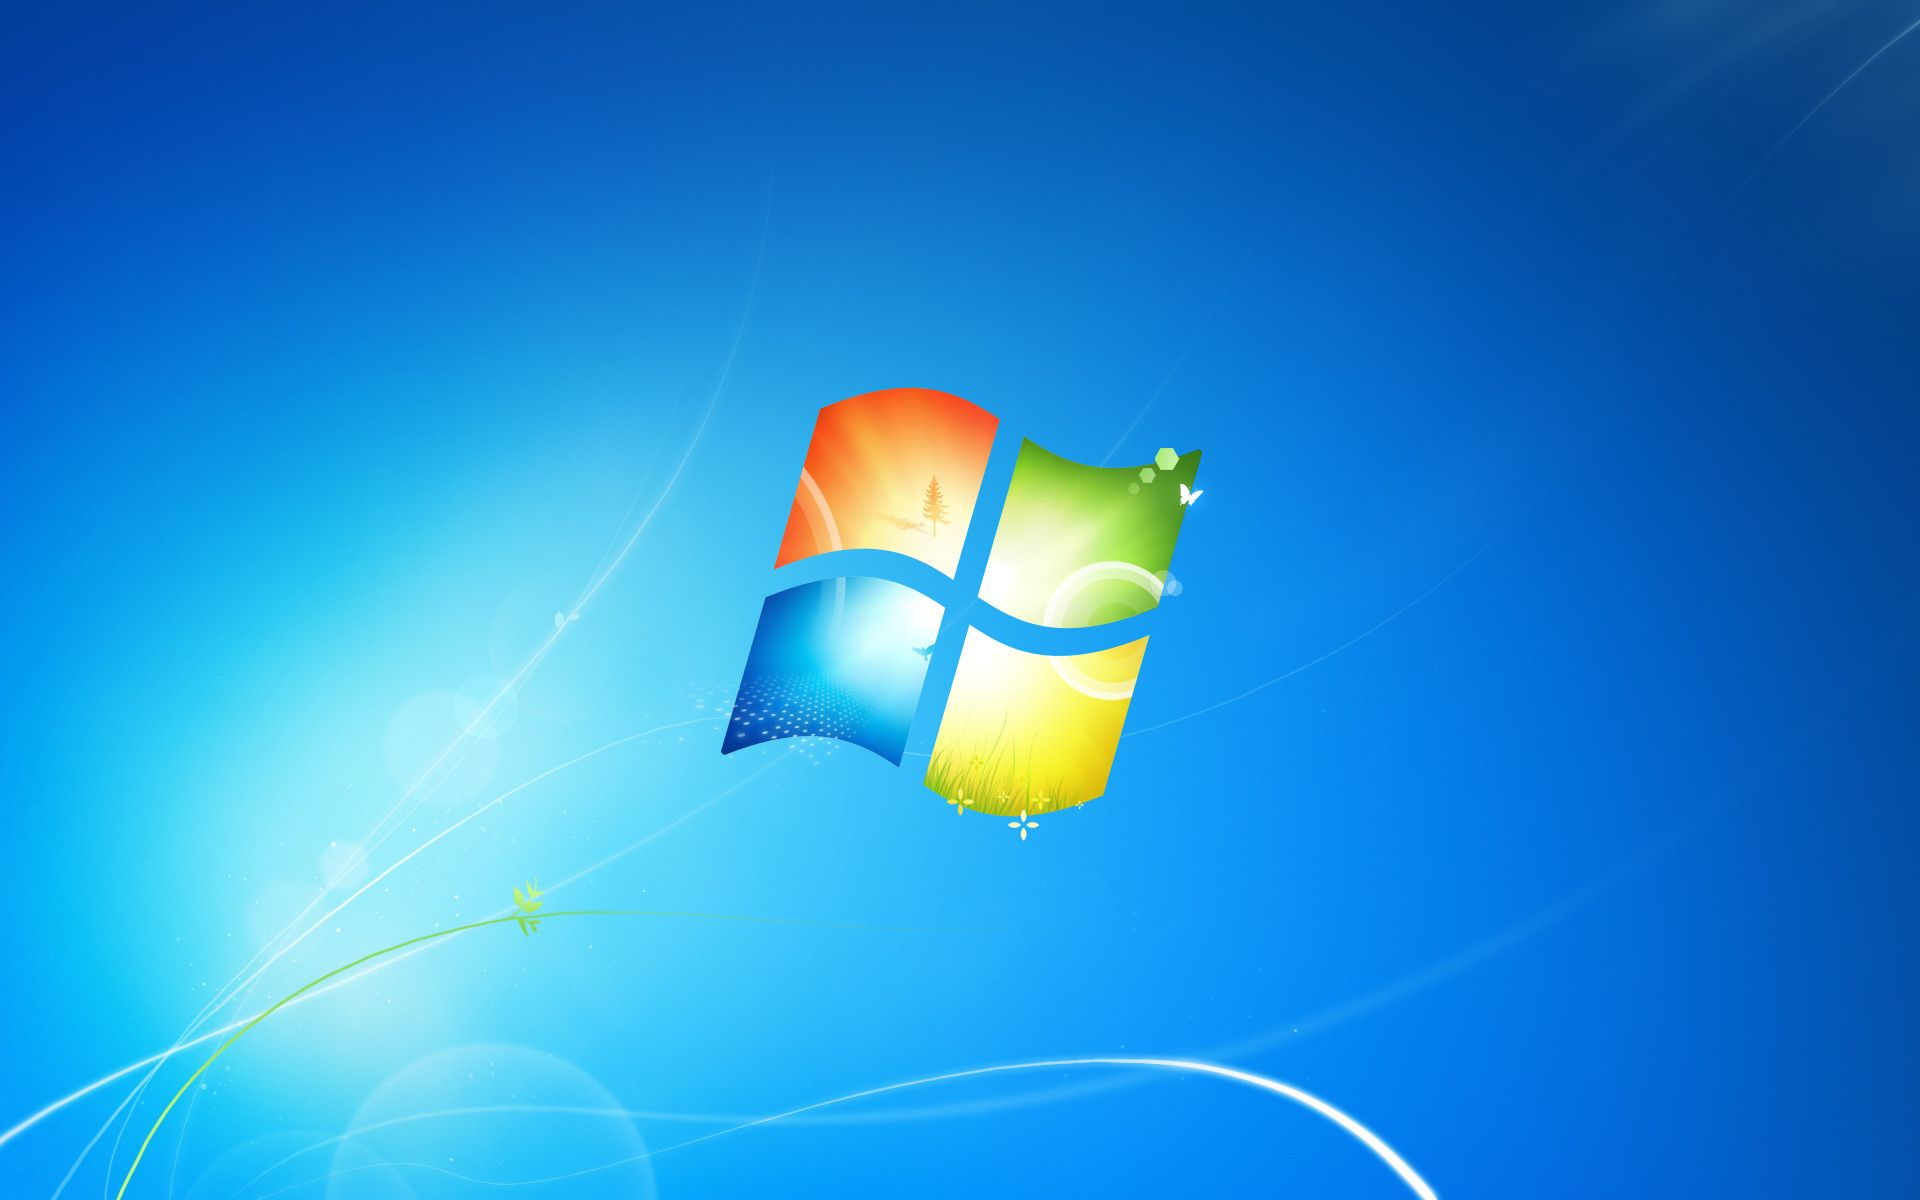 5 Things Every Stubborn Windows 7 User Should Do Digital Trends Microsoft Wallpaper Computer Wallpaper Desktop Wallpapers Desktop Background Images